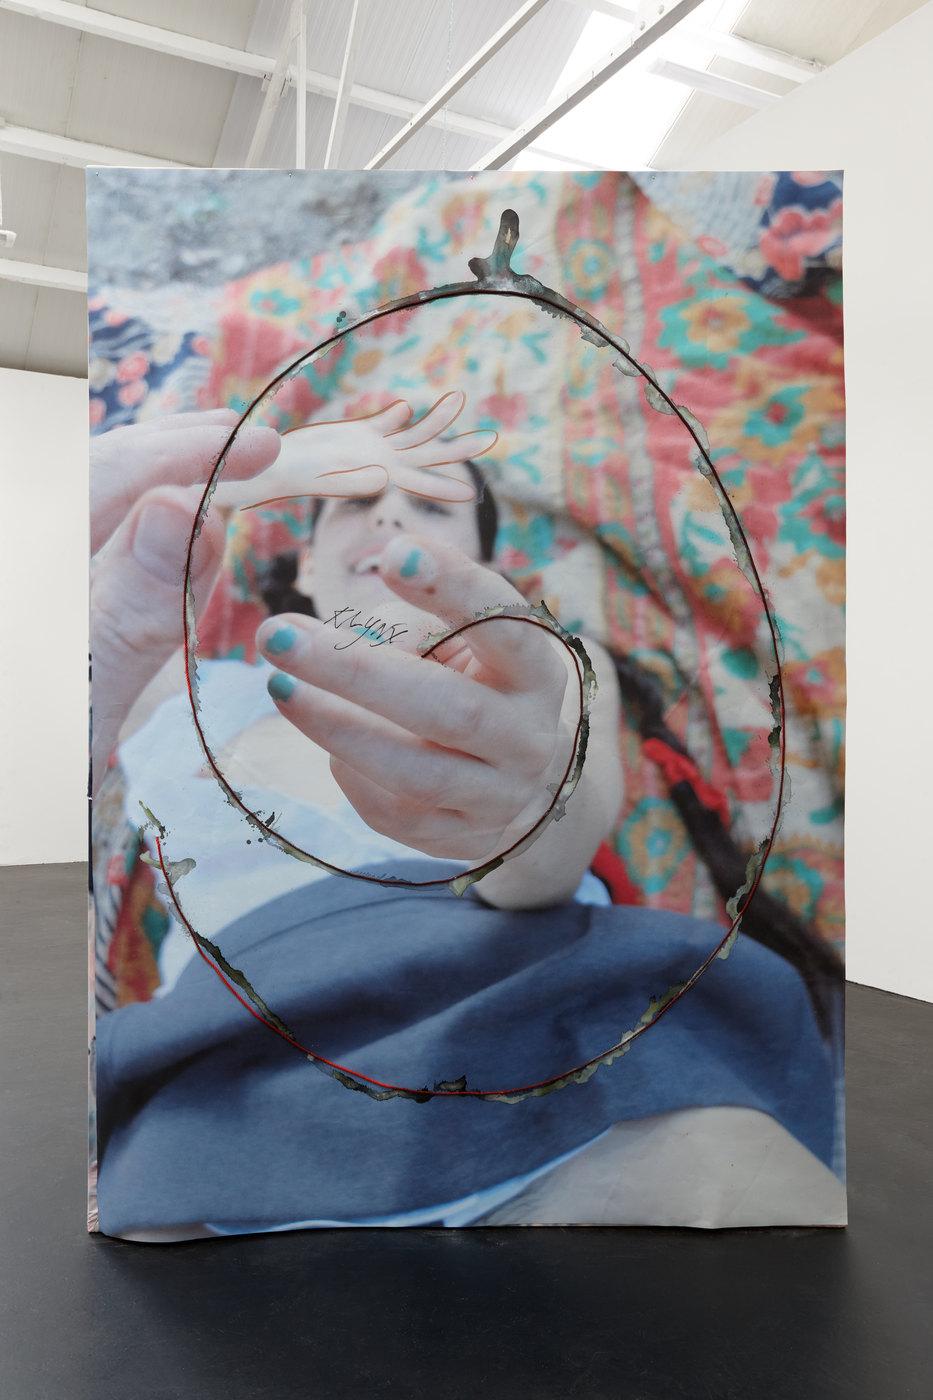 01. Nora Berman - Enter me (klynx), 2016 (ii)